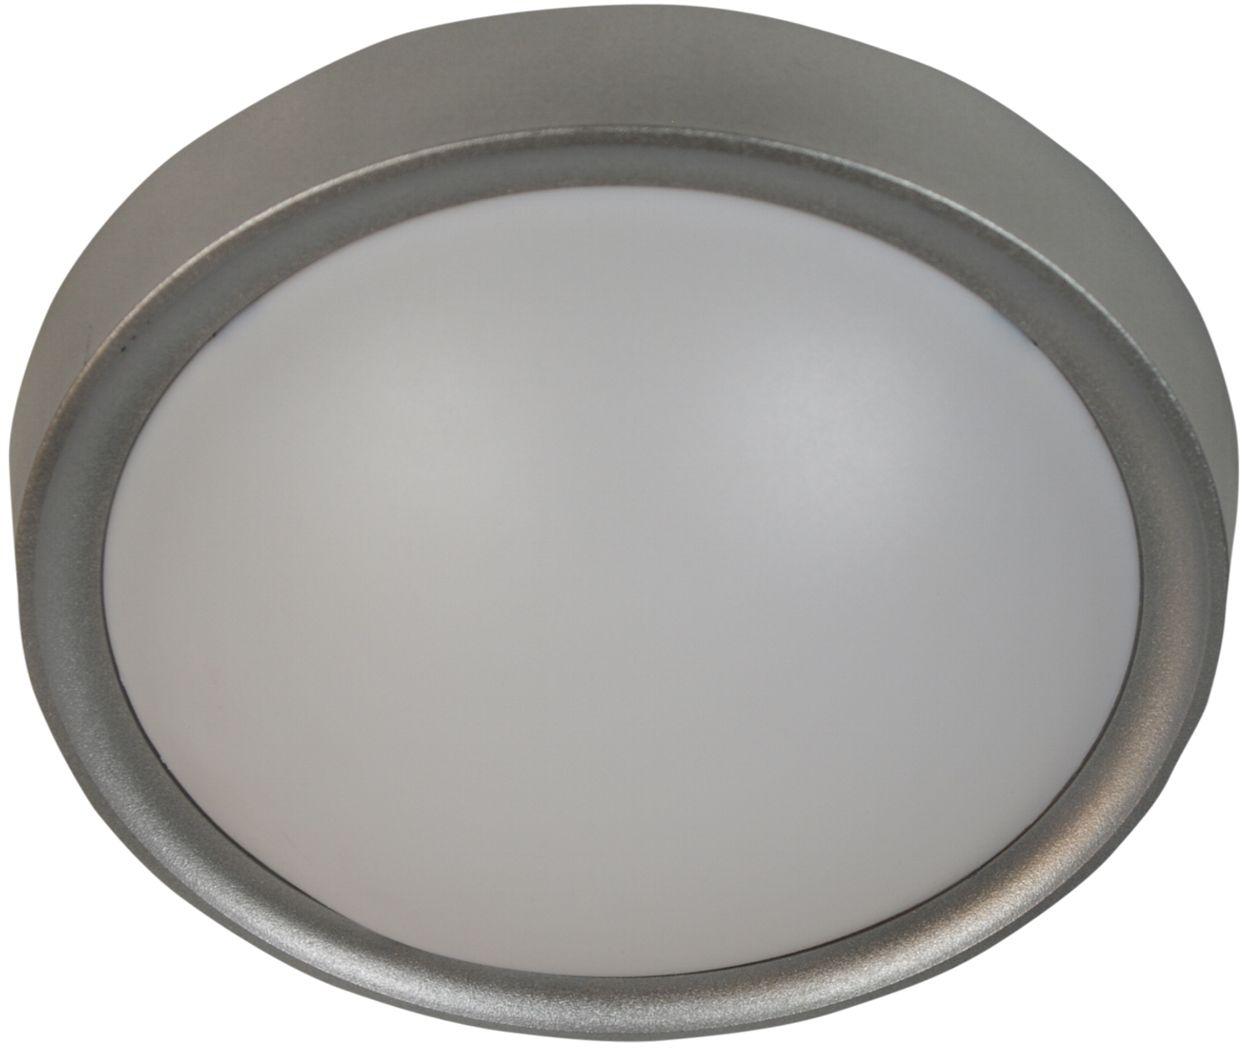 Candellux VATAN 13-11438 plafon lampa sufitowa szara 1X11W E27 30cm